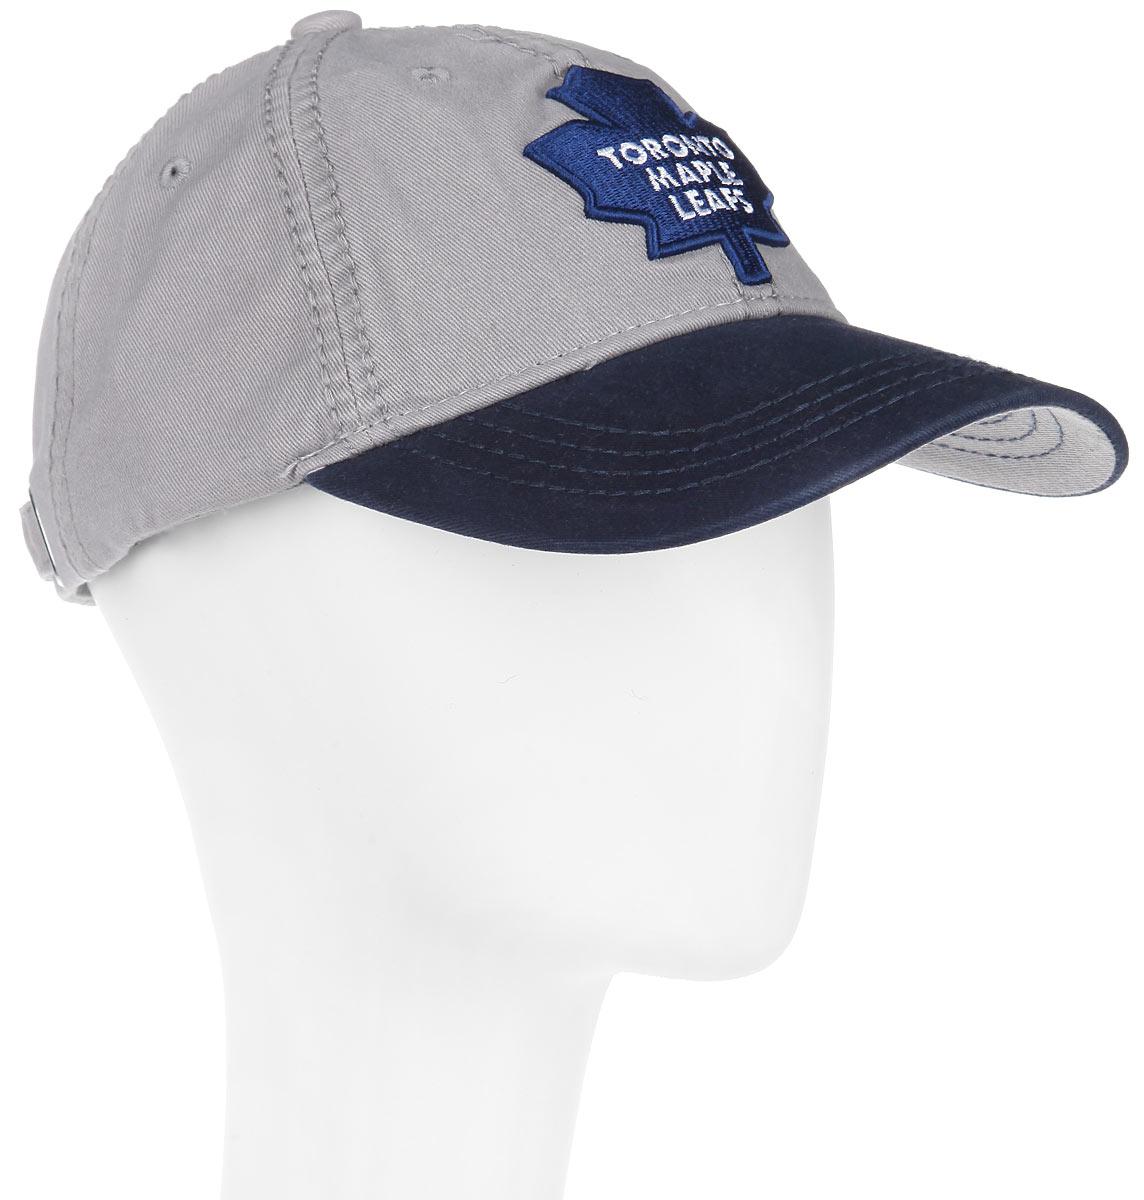 Бейсболка NHL Toronto Maple Leaf, цвет: серый, темно-синий. 29057. Размер LXL (55-58)